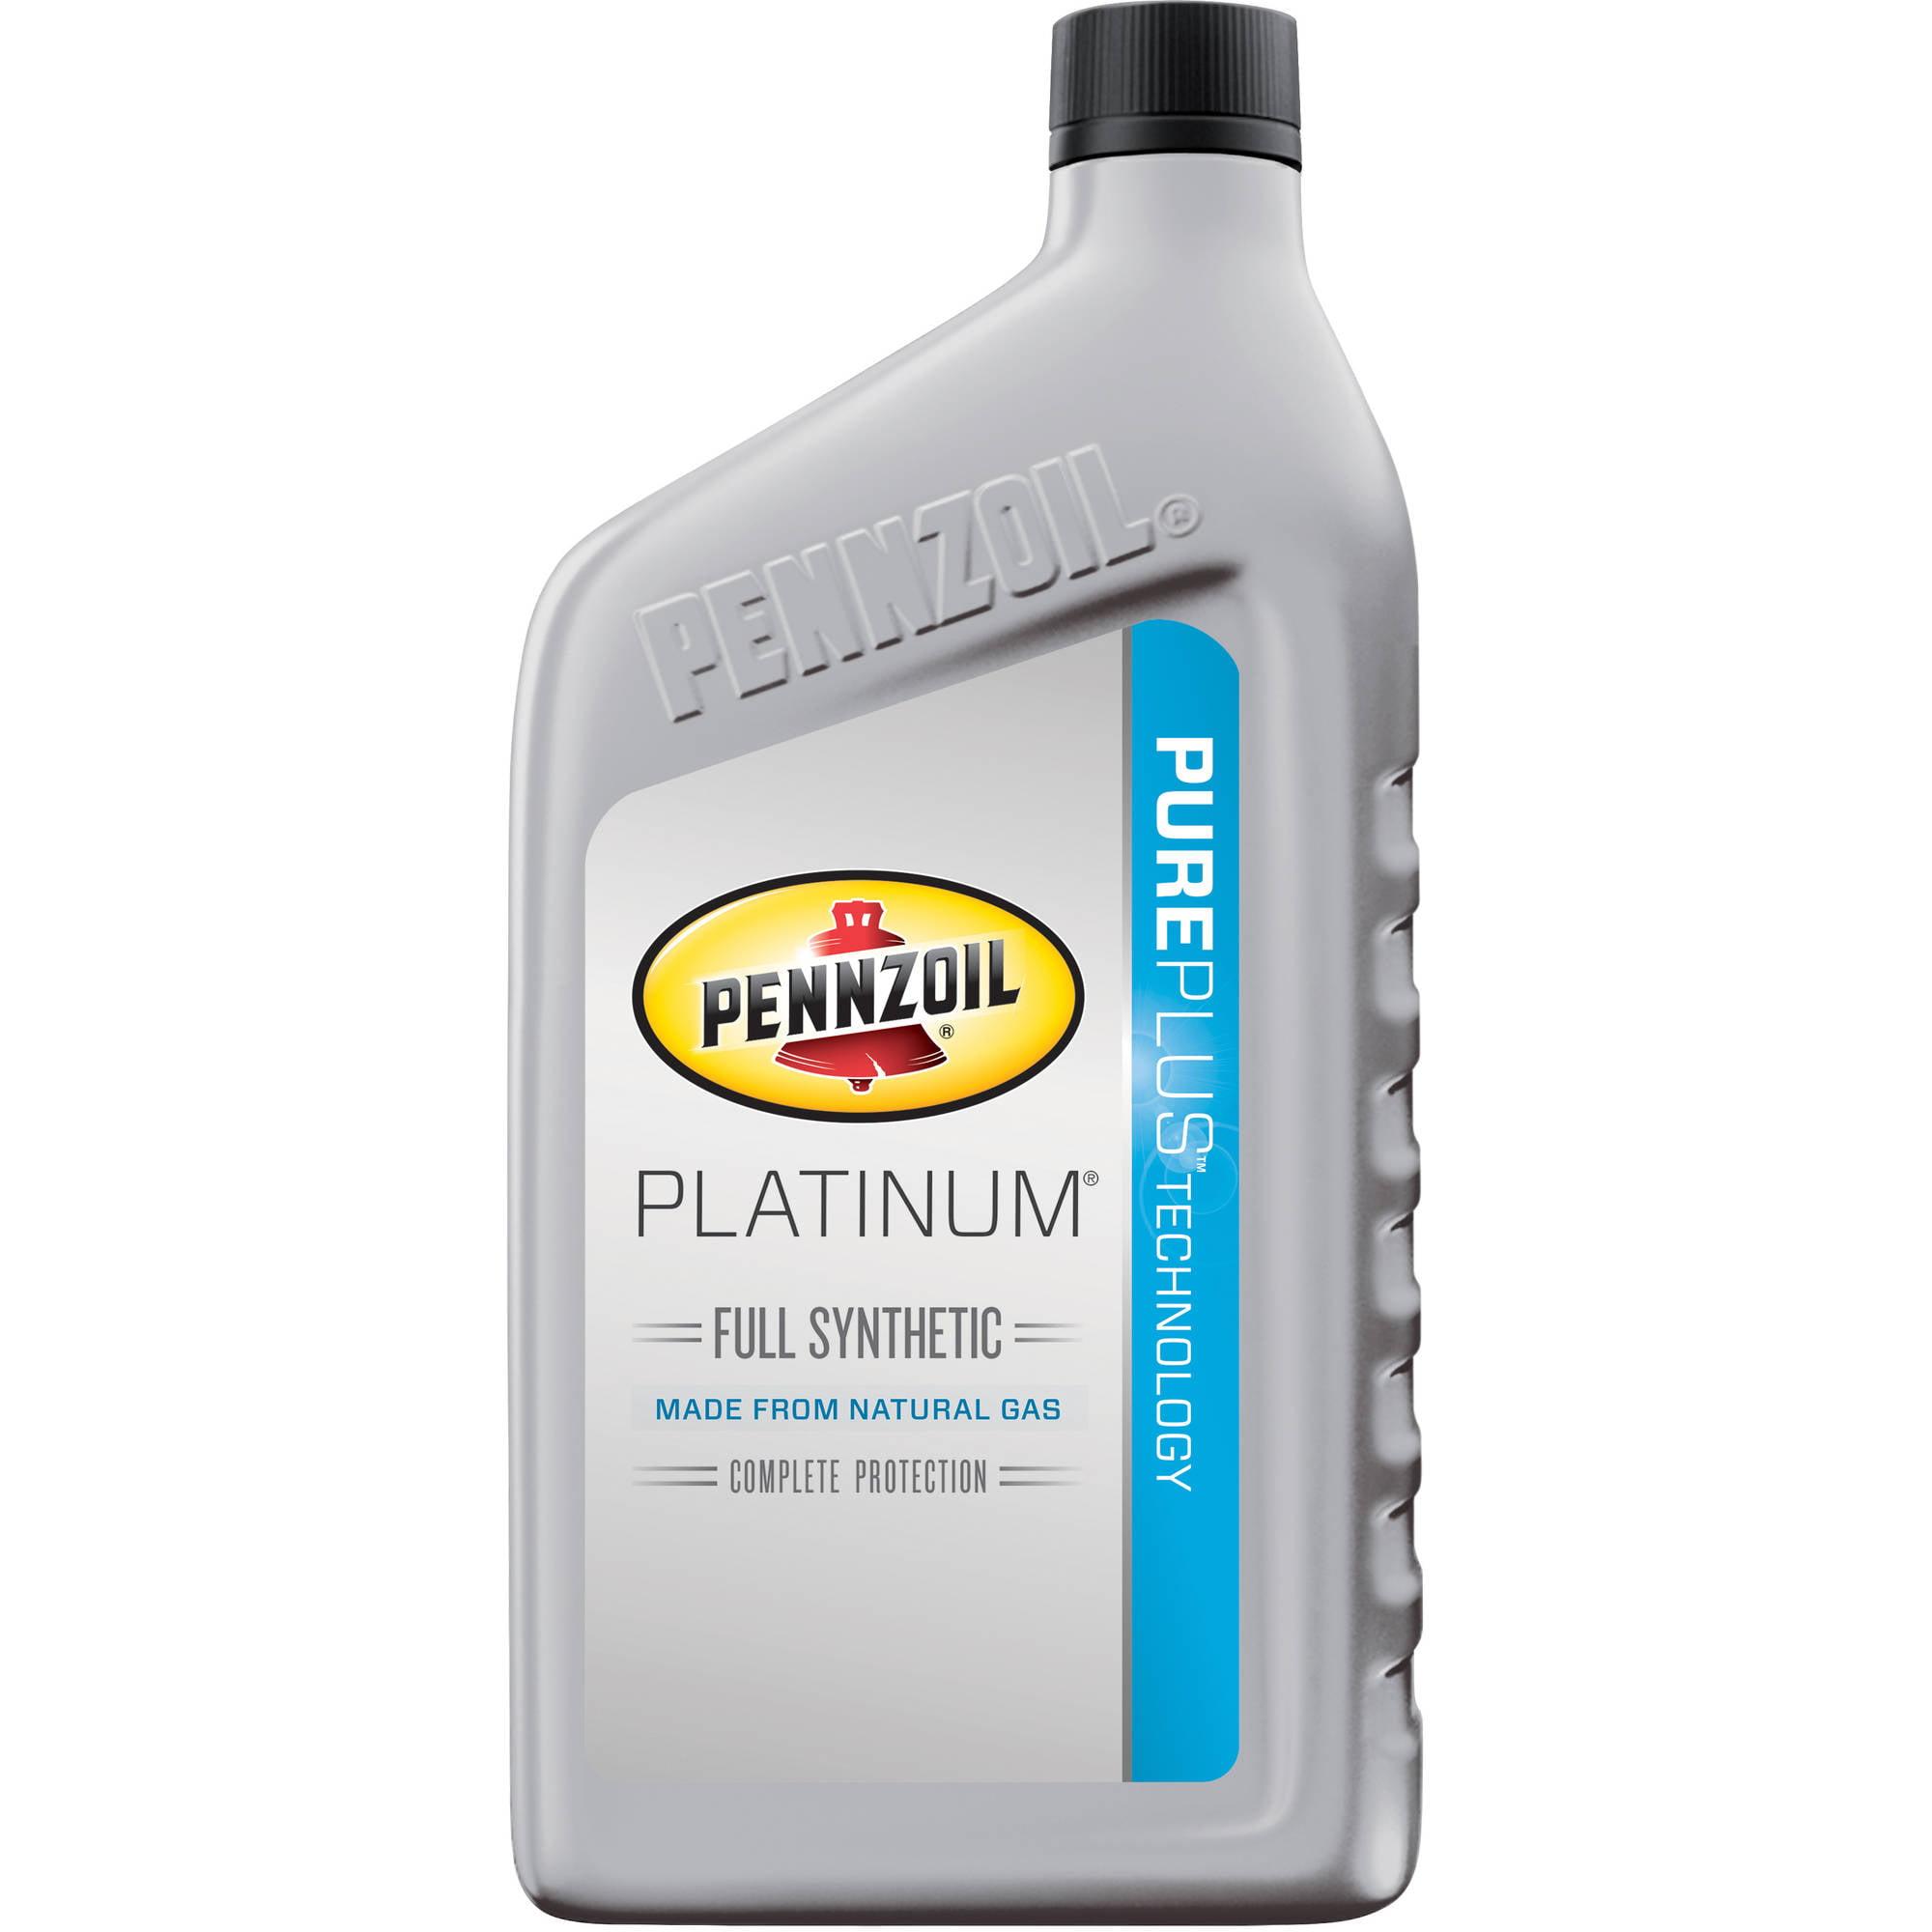 Napa Premium Performance Sae 5w 30 Motor Oil Msds